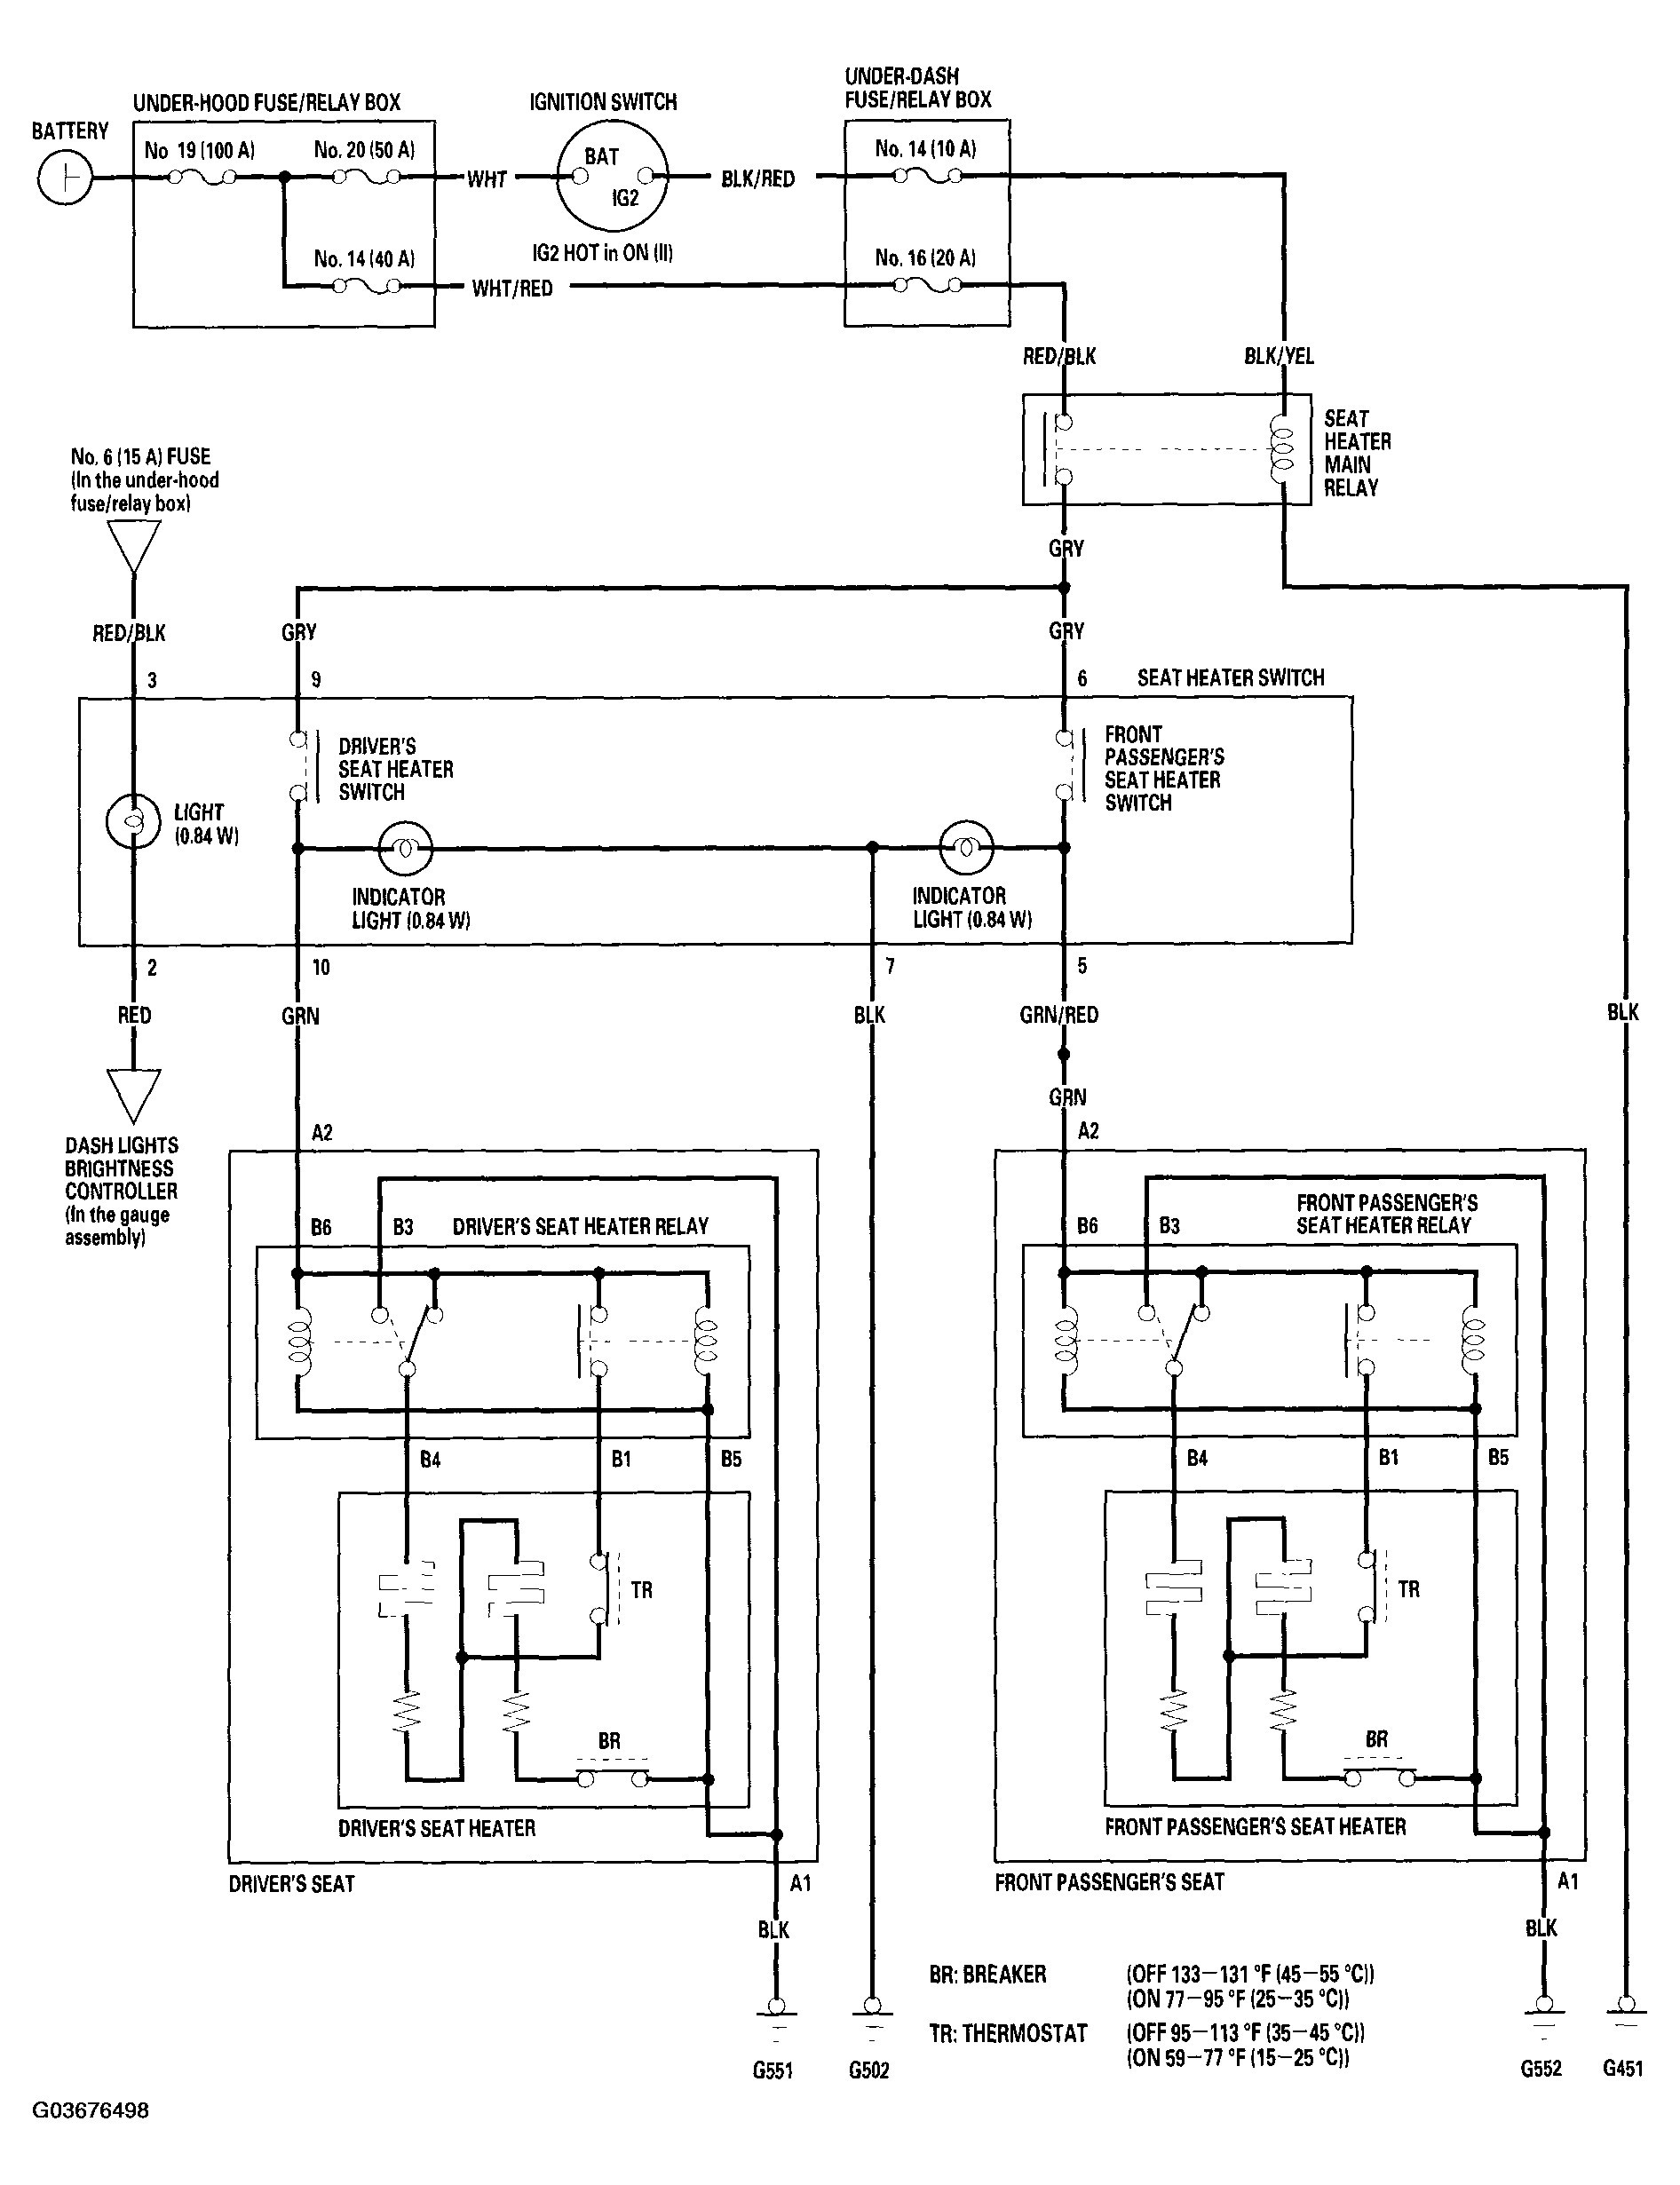 1993 Honda Accord Engine Diagram 1995 Cr 93 Fuse Box V Besides